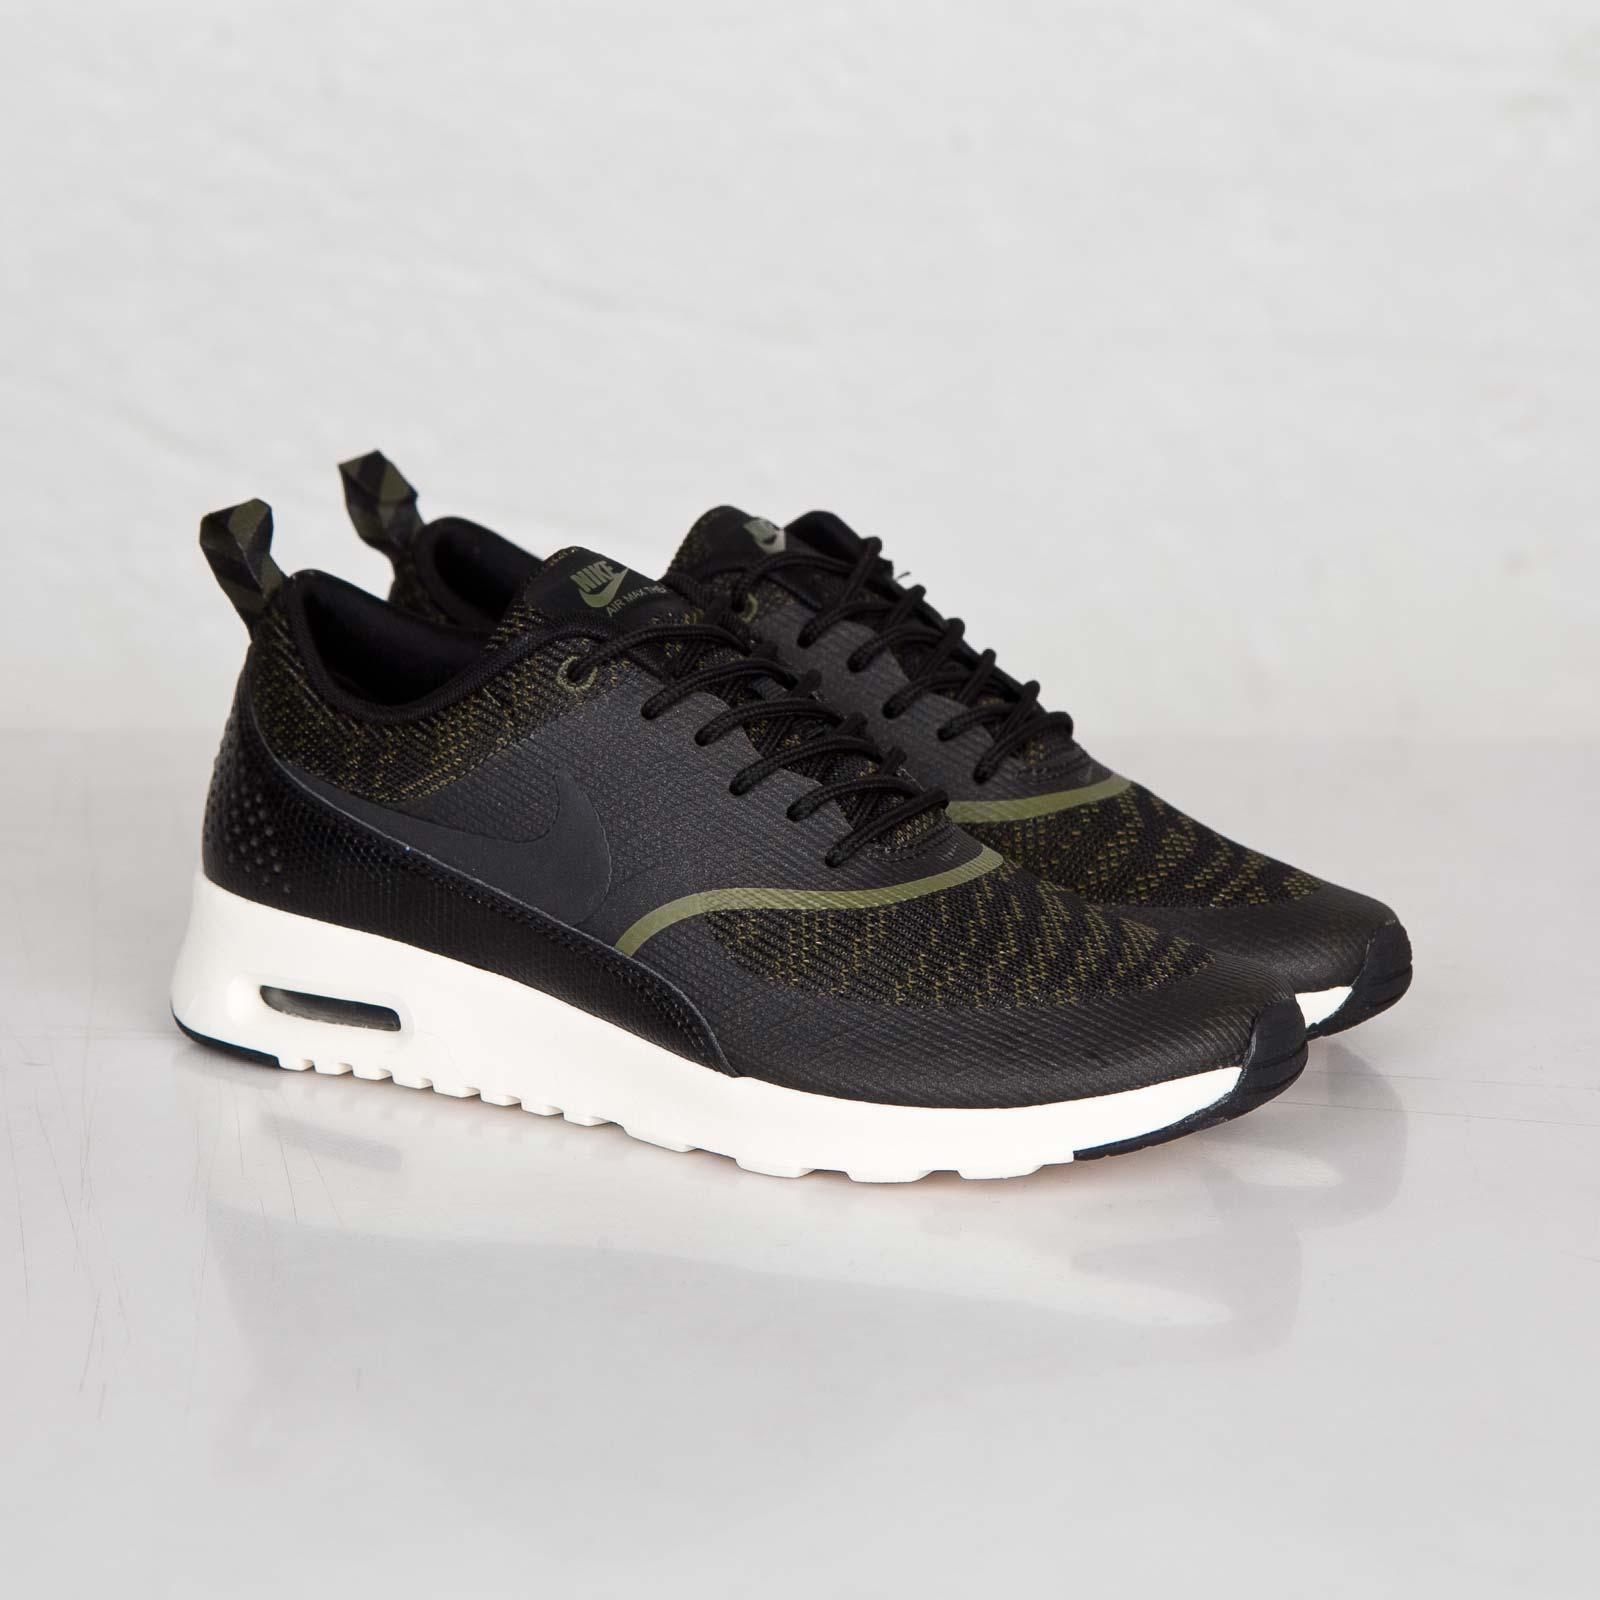 Nike W Air Max Thea Knit Jacquard 718646 300